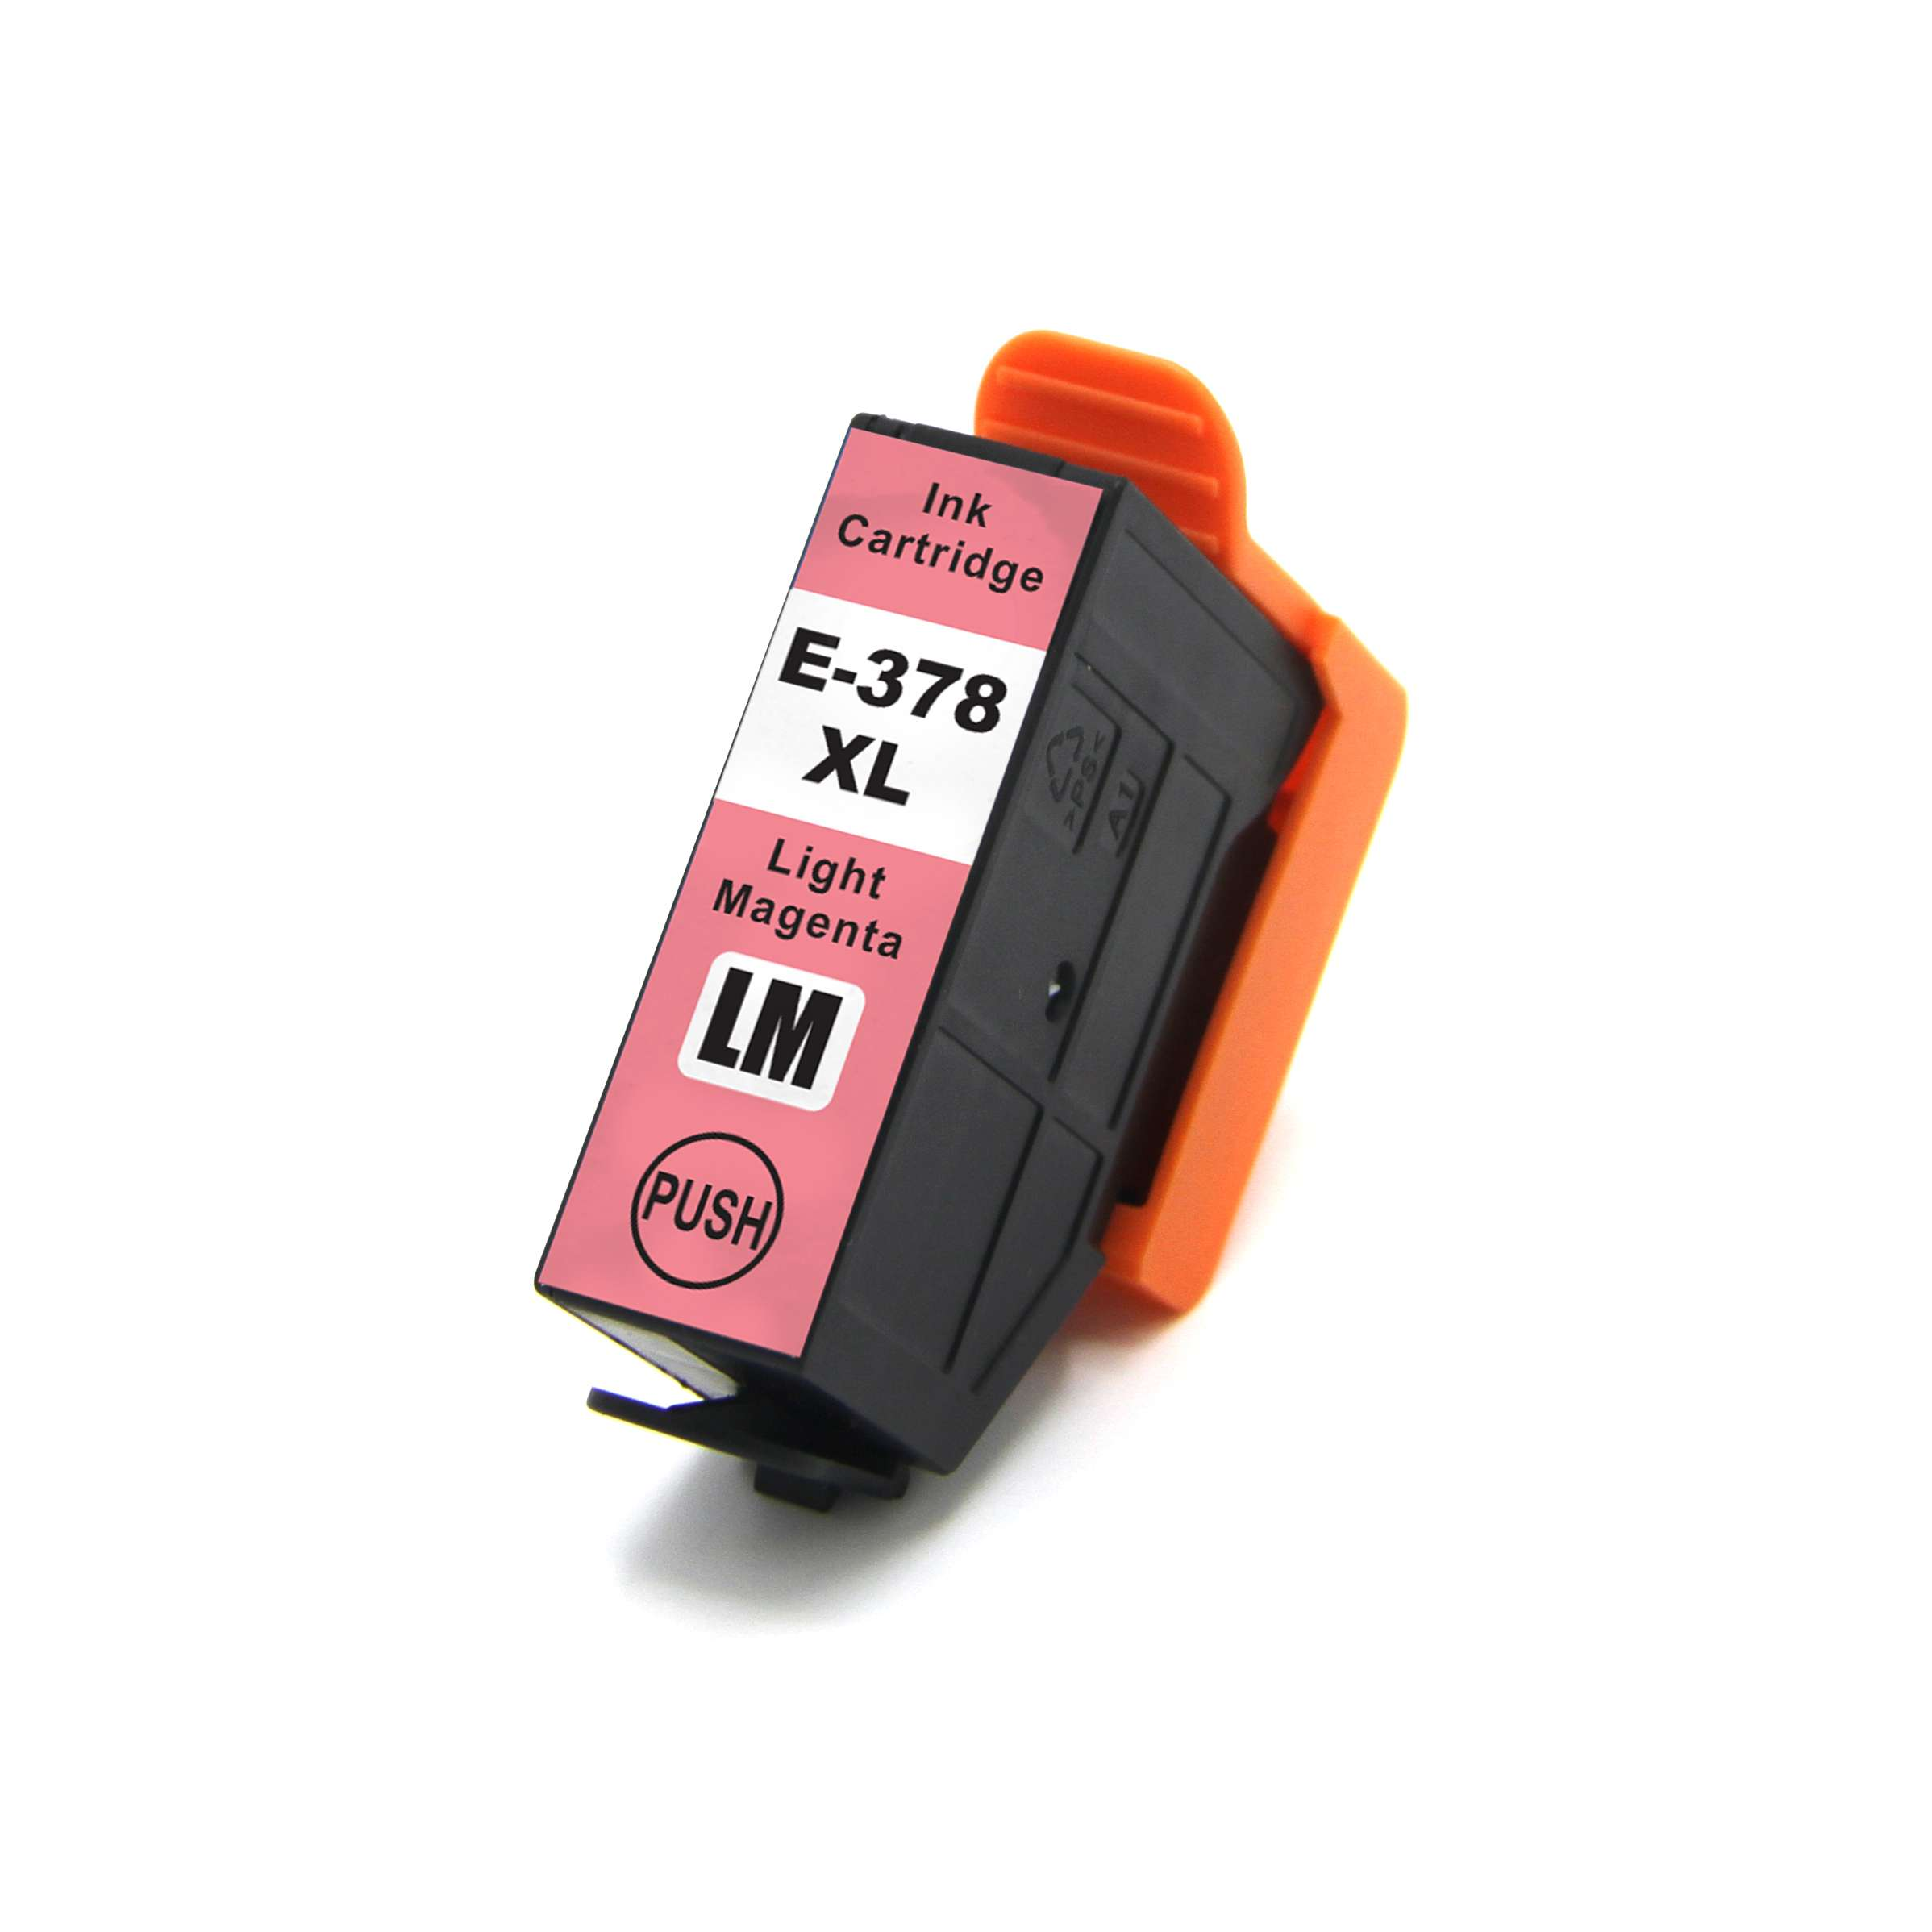 Epson T378XLLM Light Magenta Ink Cartridge